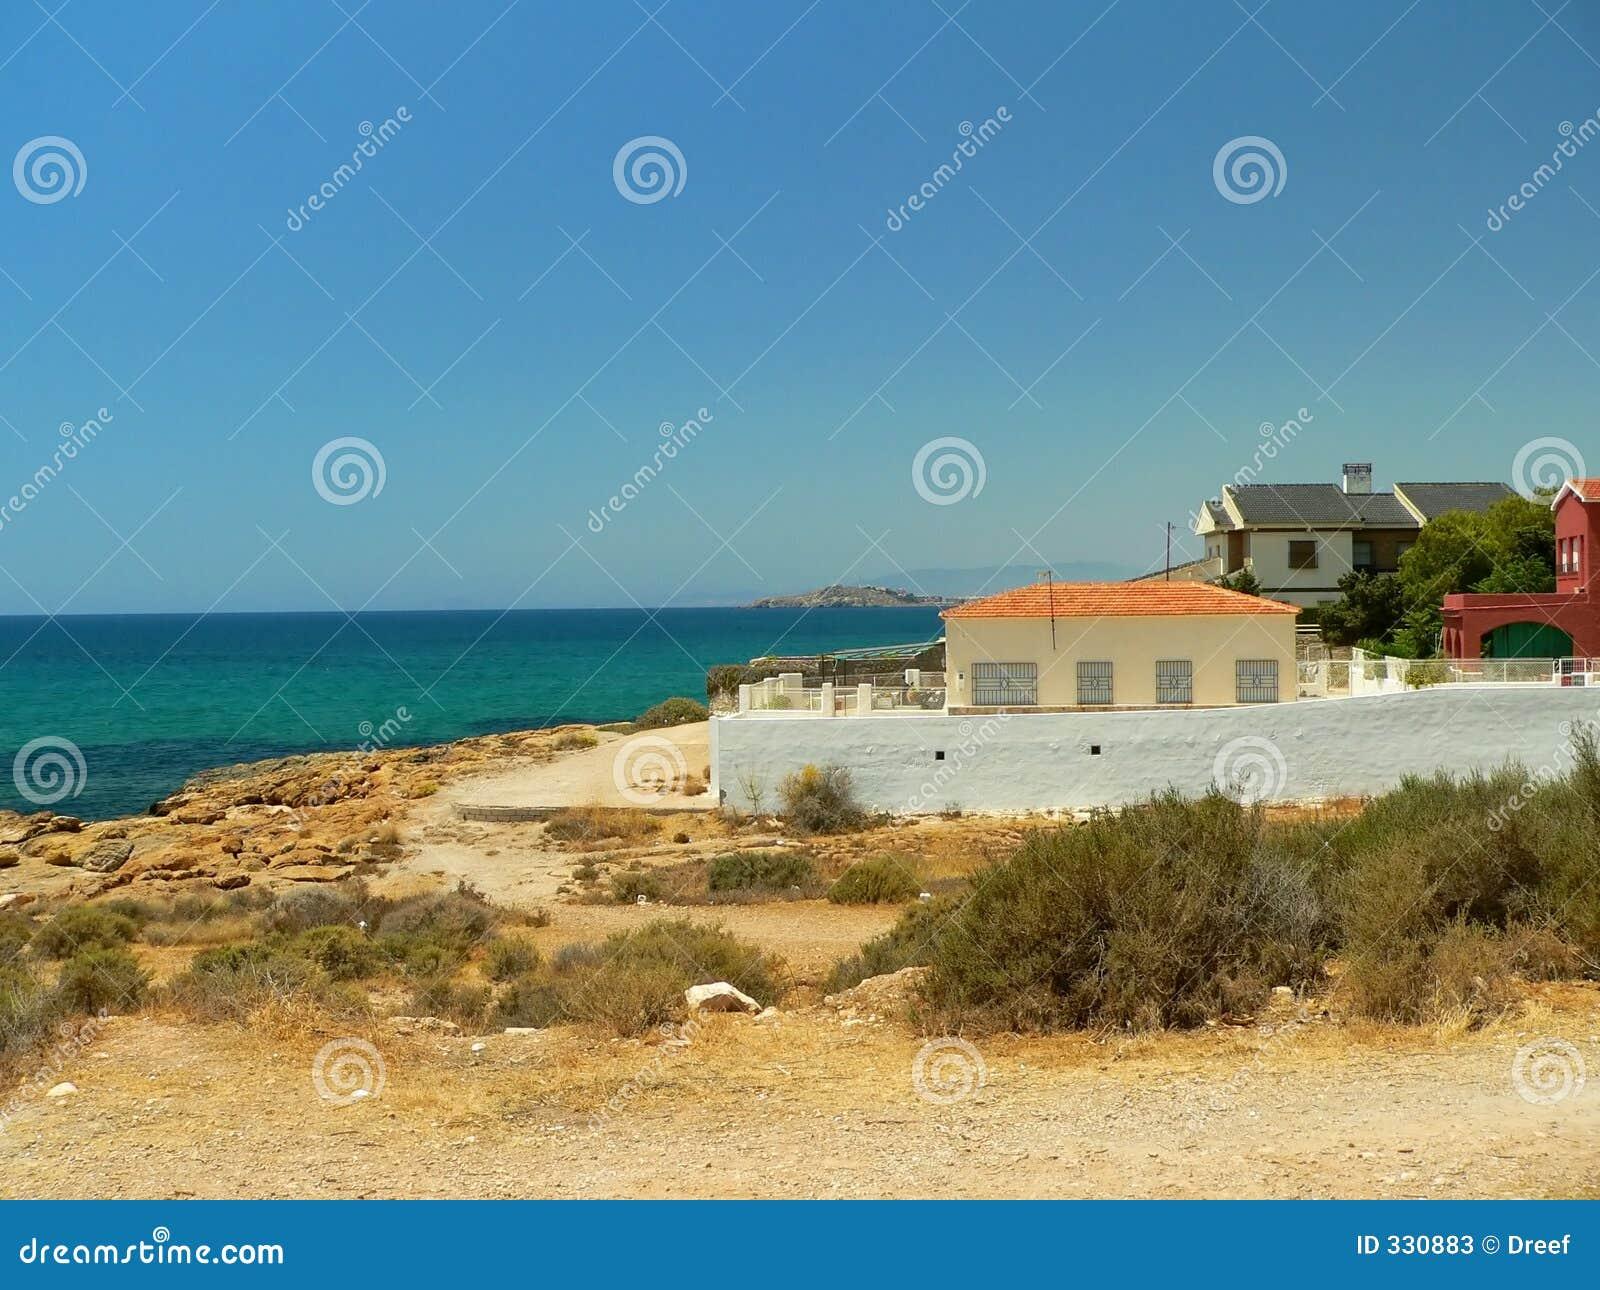 Coastline in Spain